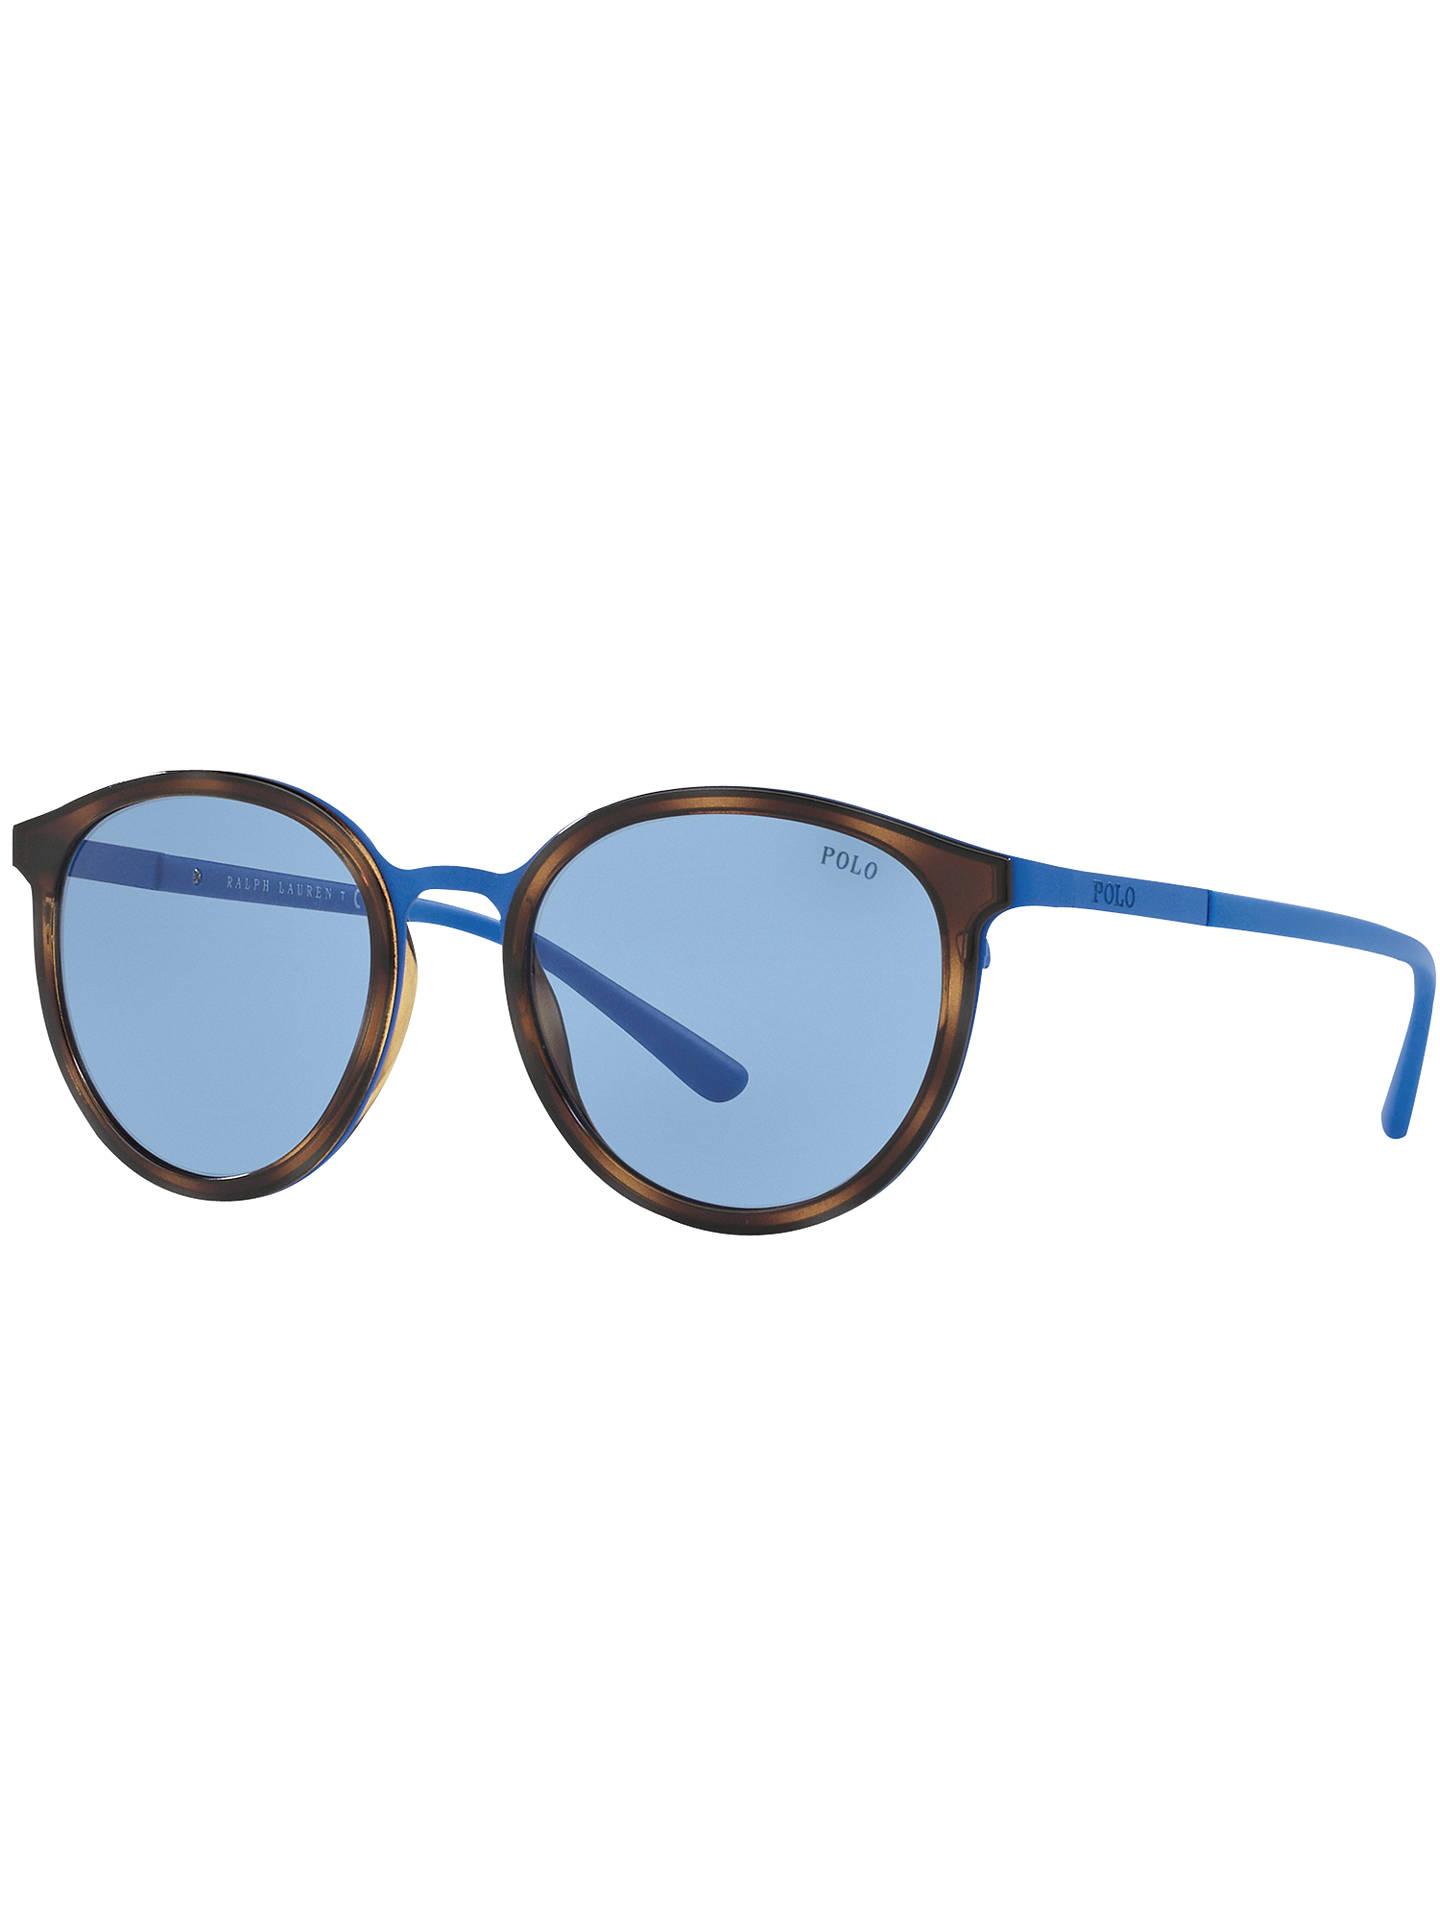 For Glasses 67c20 Blue Code Promo 2004d Lauren Ralph QshCdrt